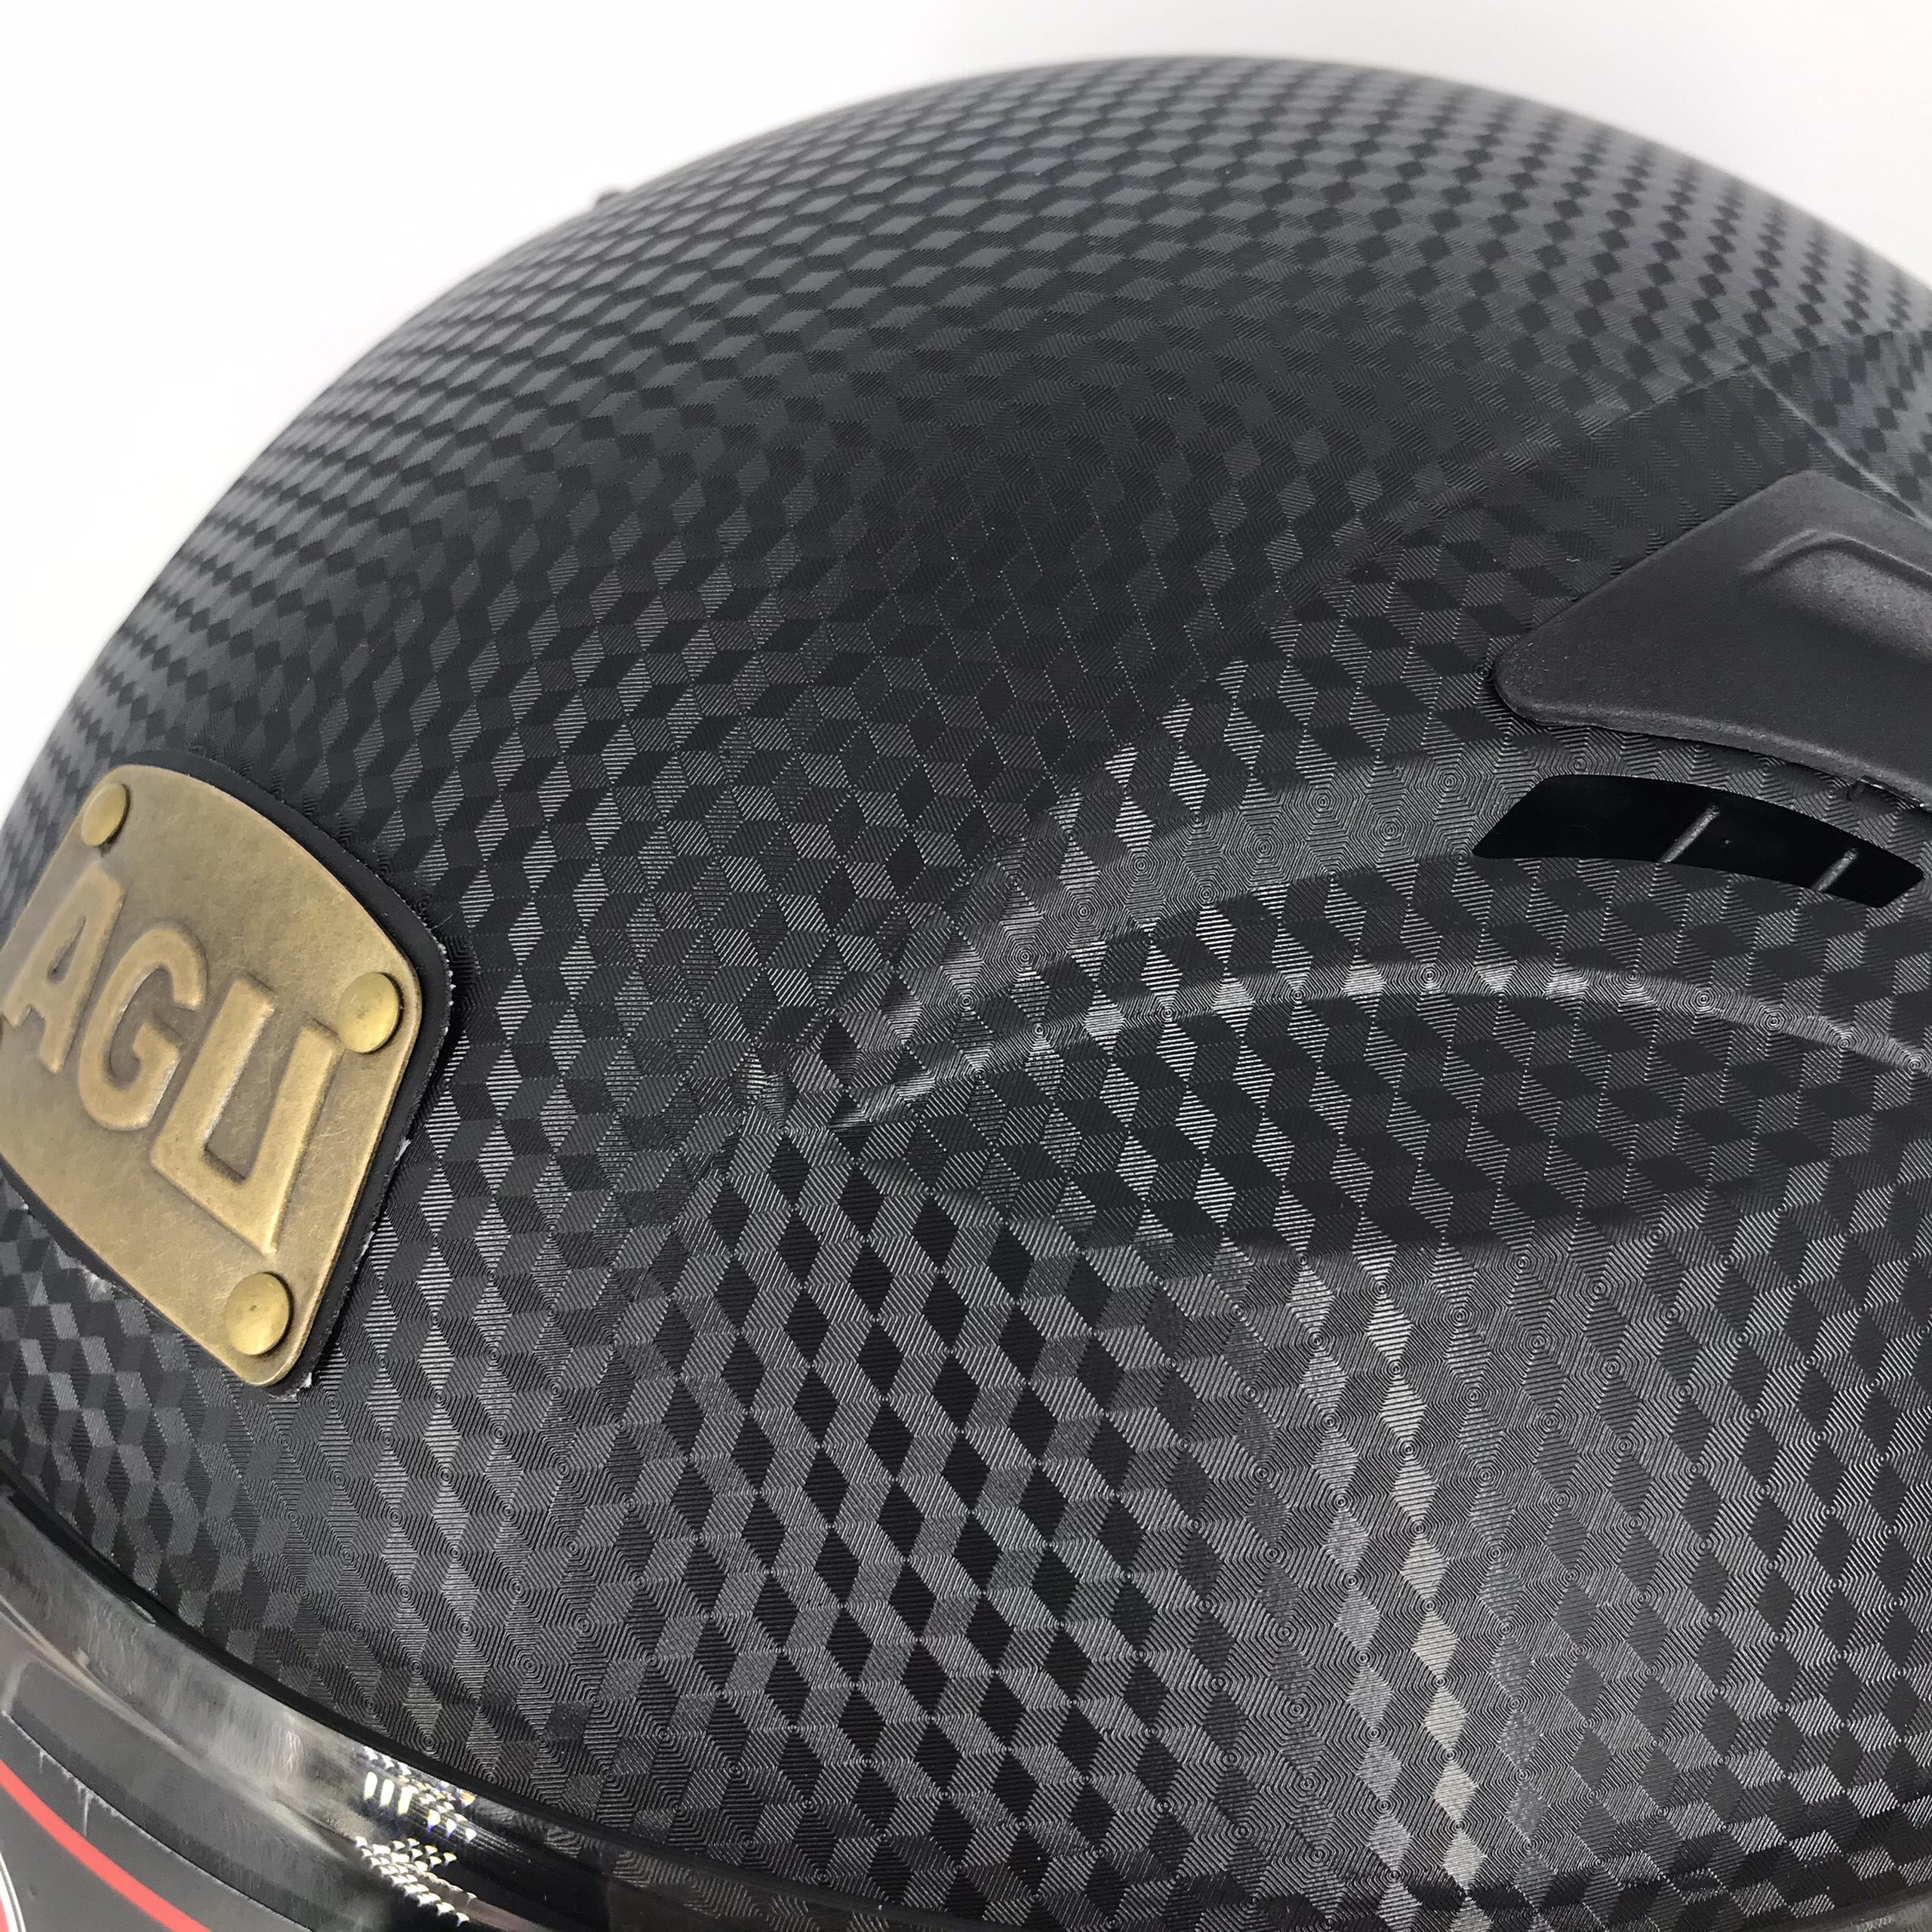 Mũ bảo hiểm fullface AGU đen vân carbon cao cấp